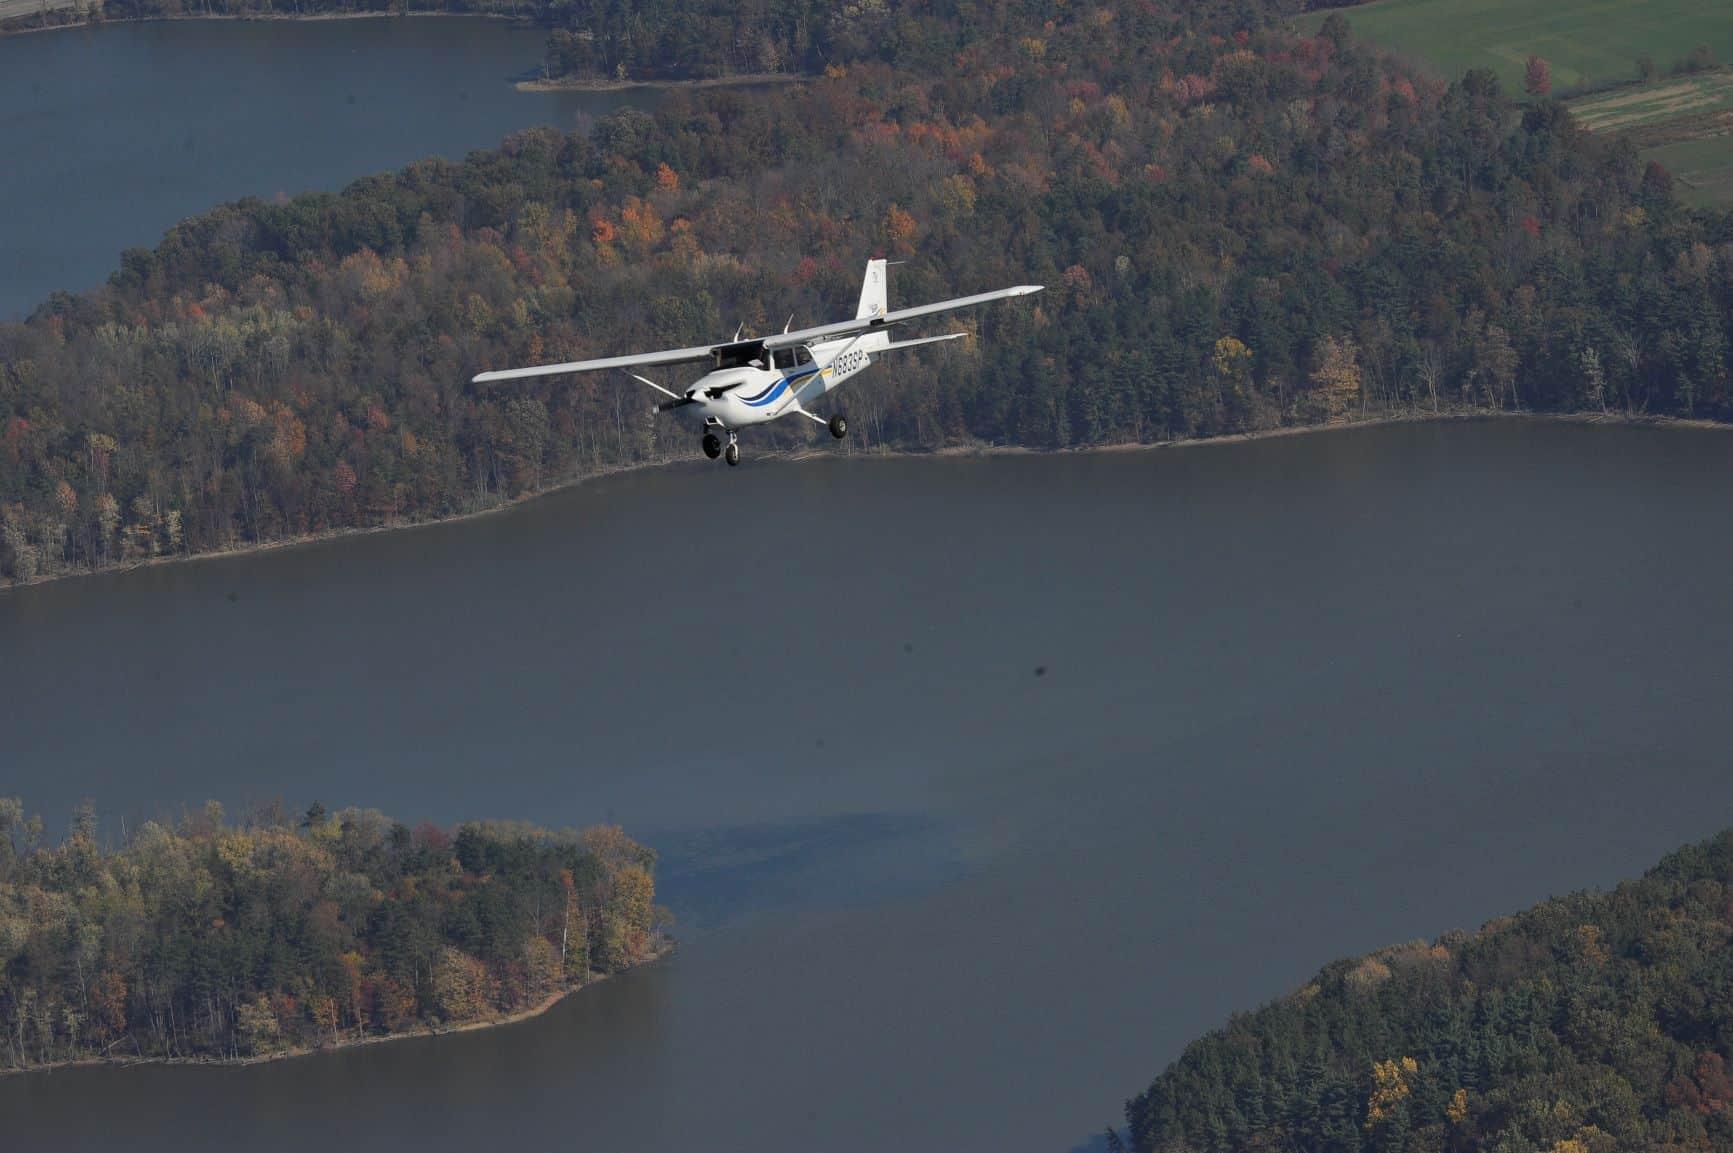 Plane Over River